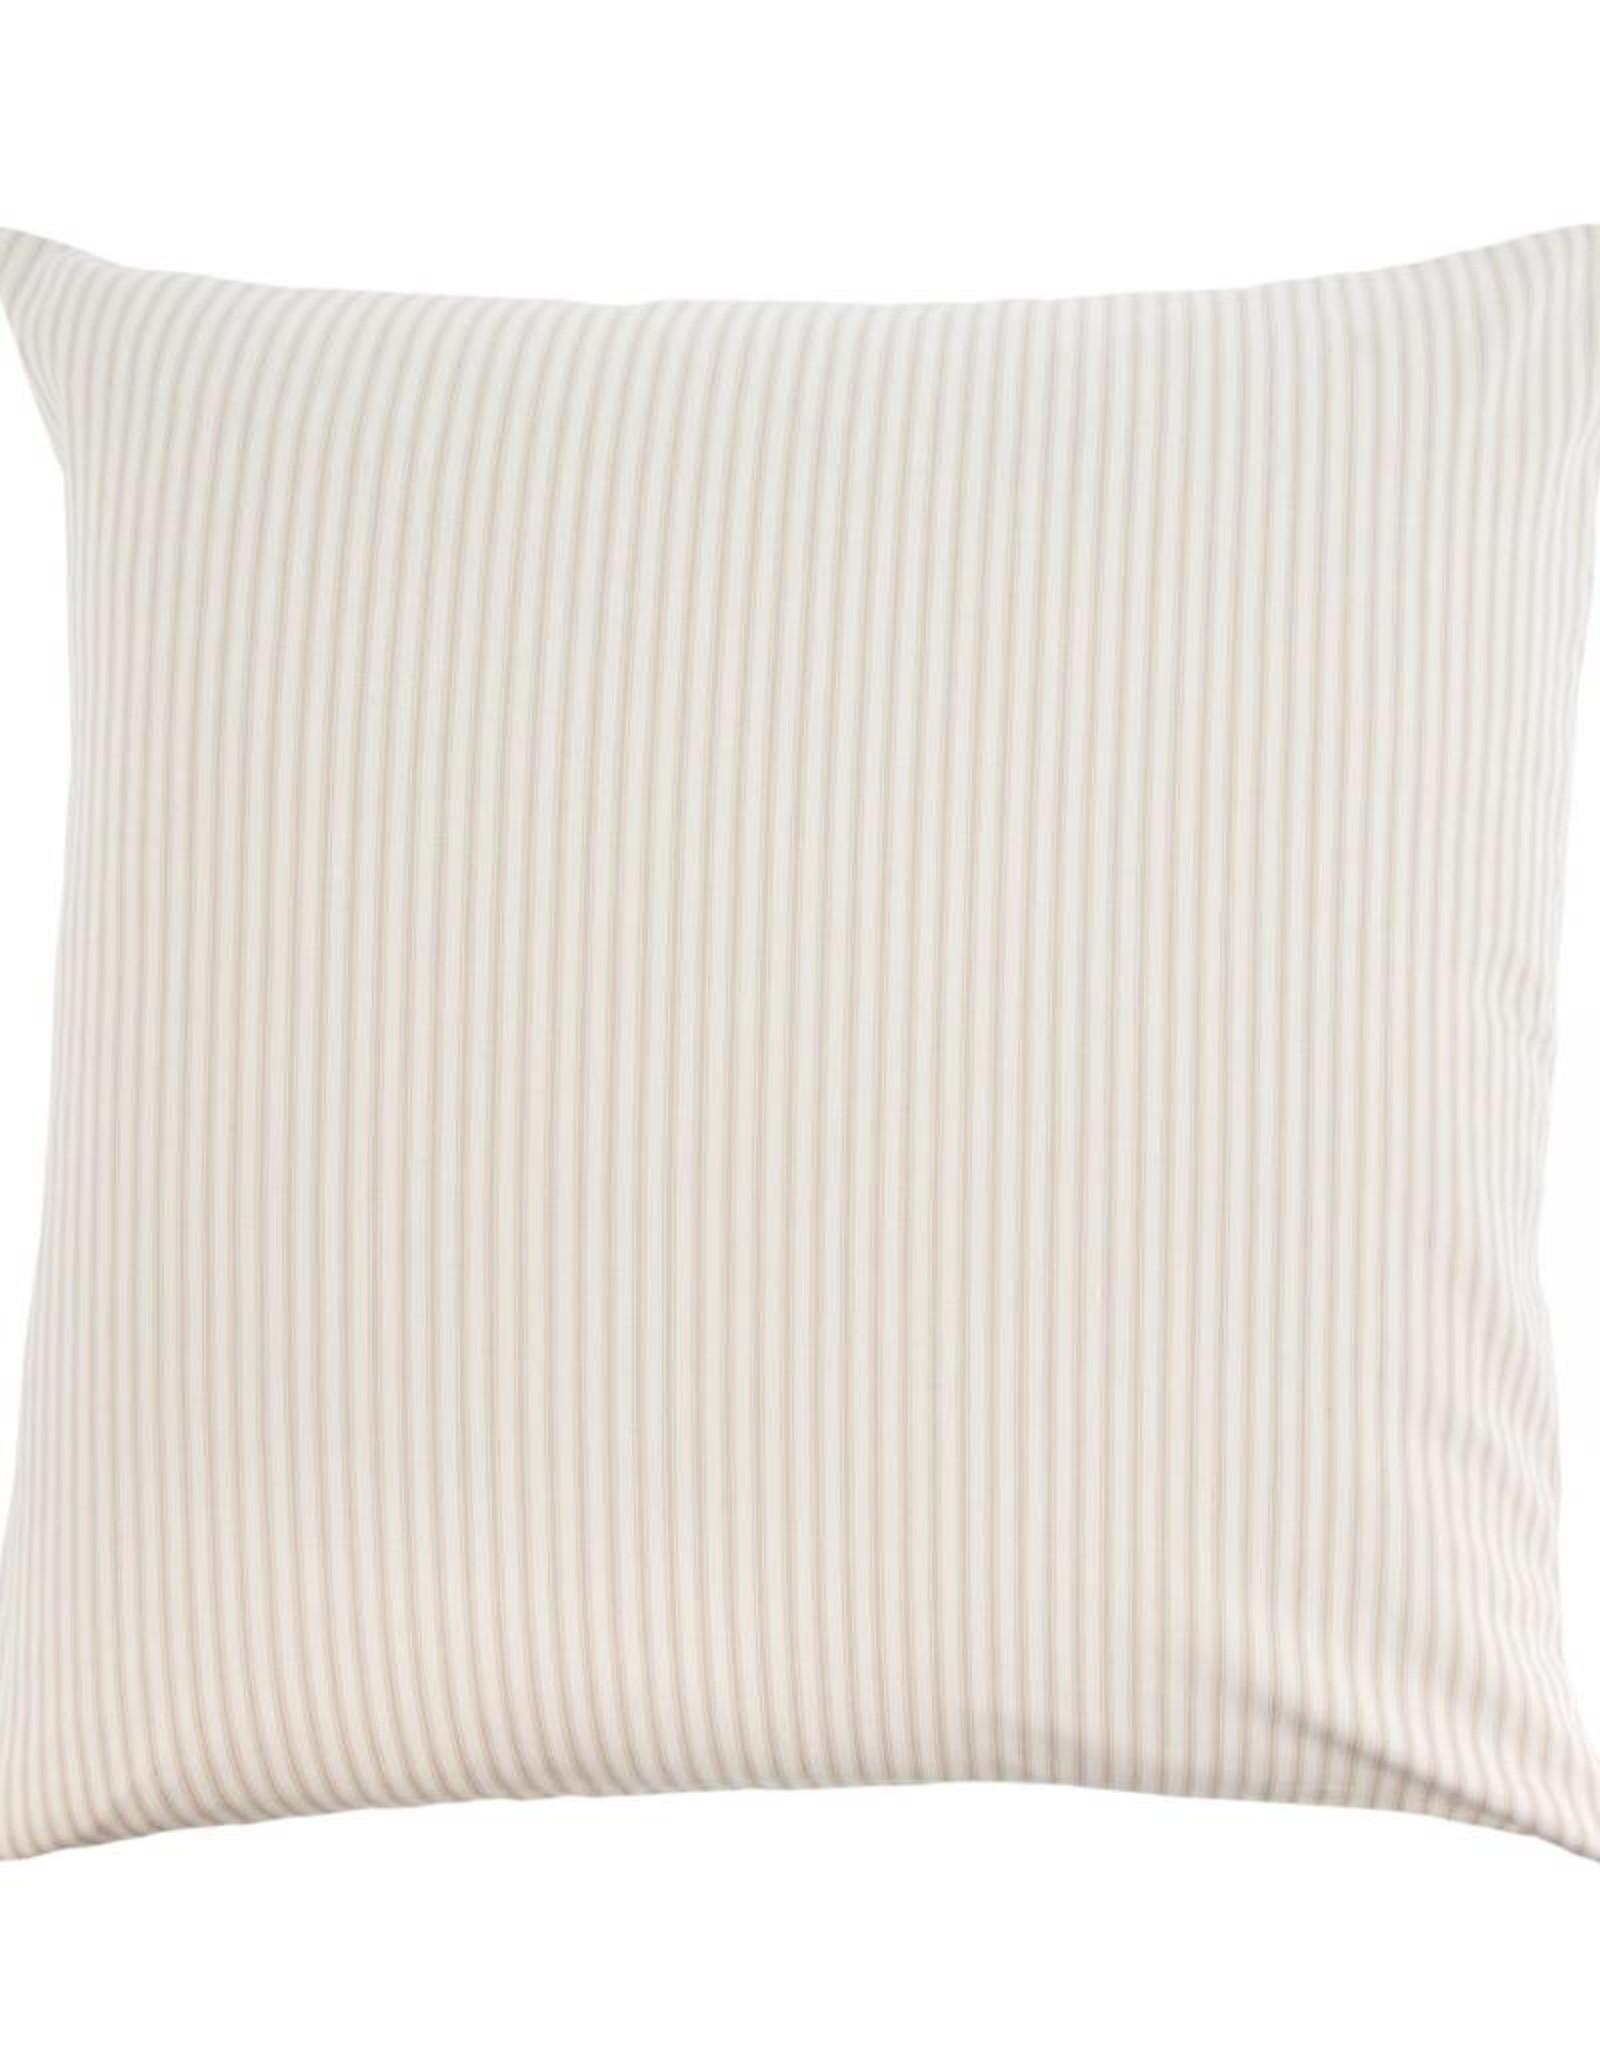 Indaba Ticking Pillow - Beige